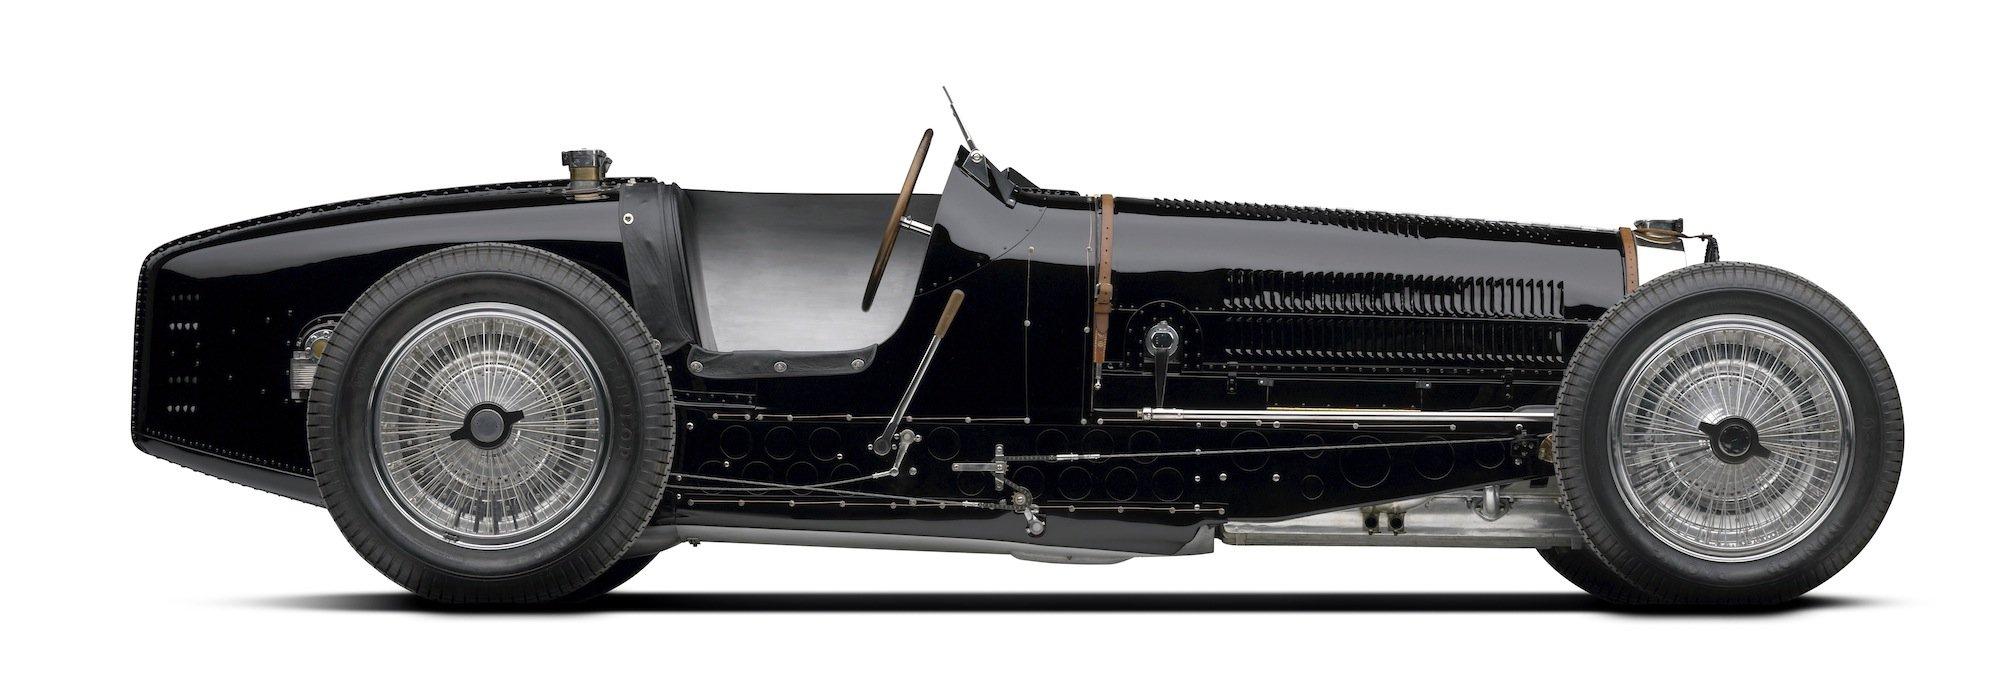 1933-Bugatti-Type-59-GP-other-side